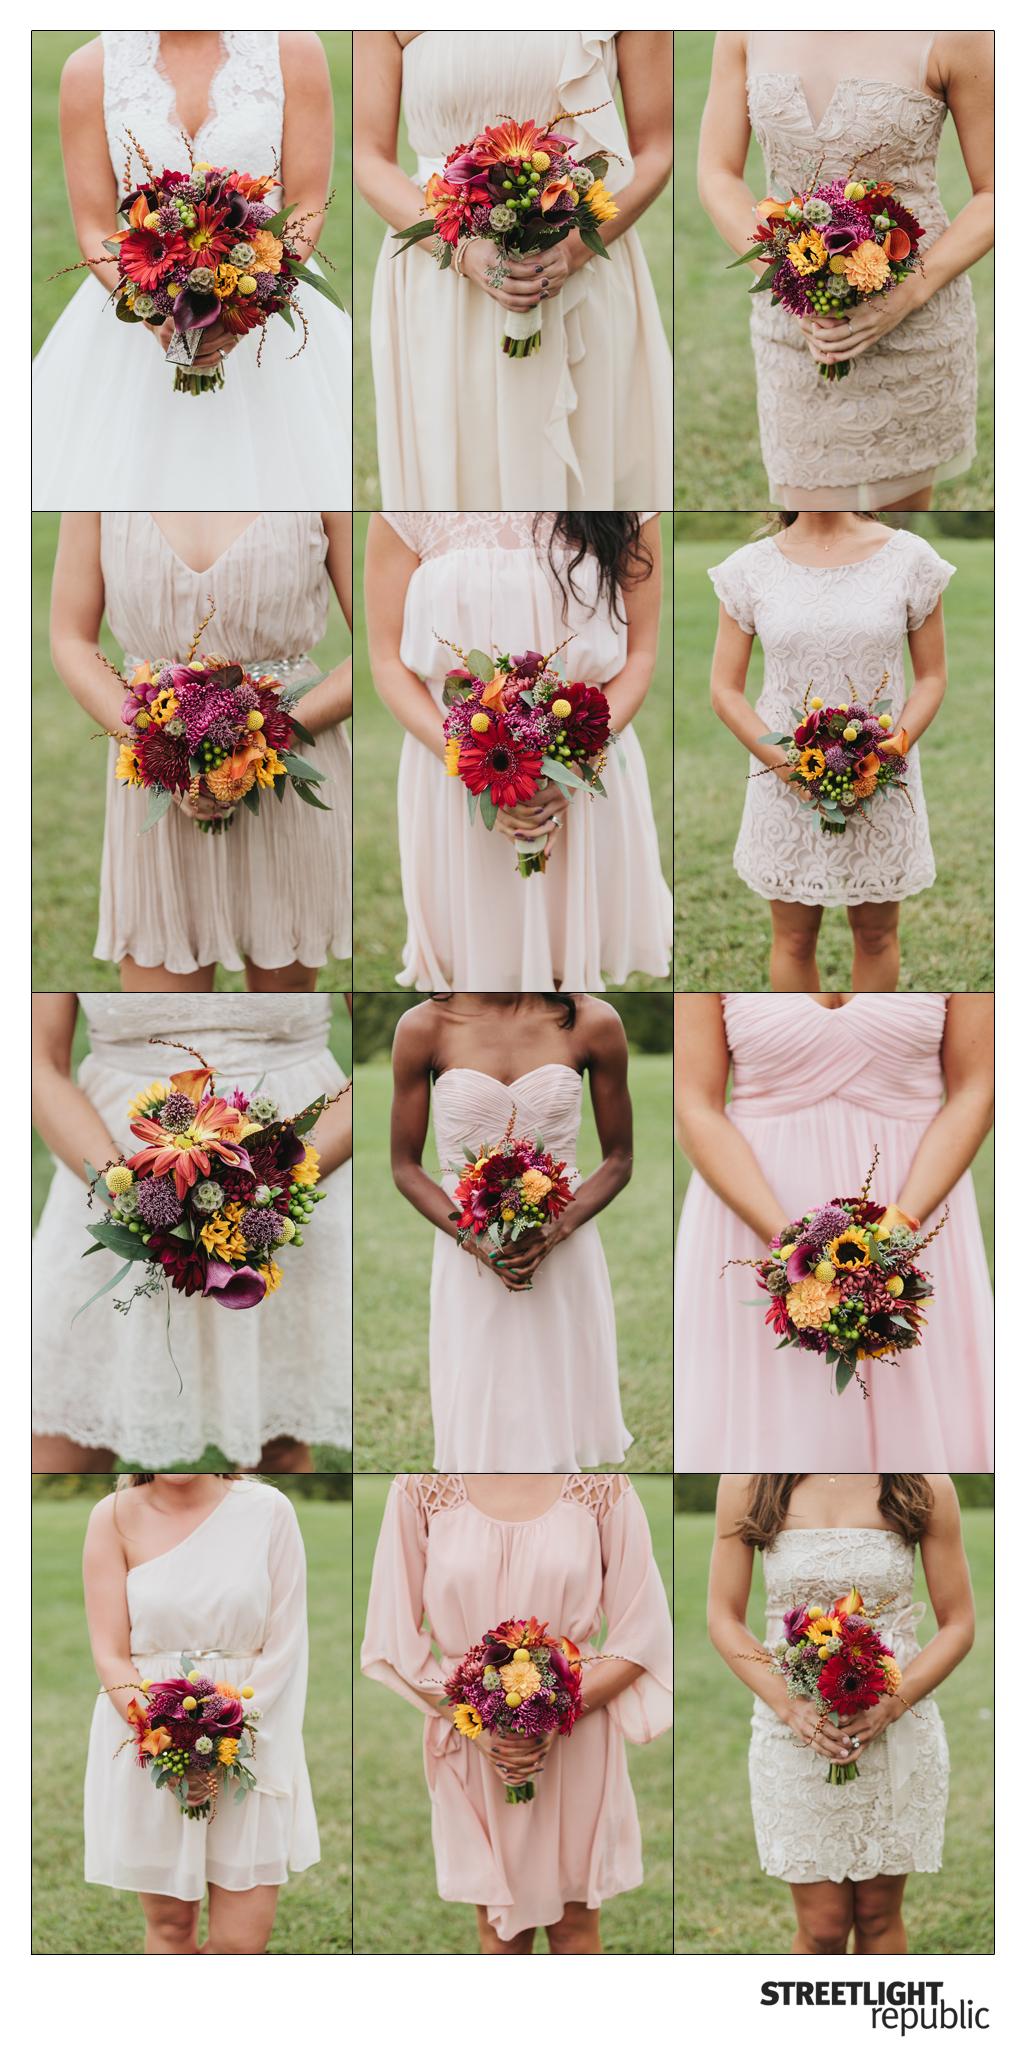 Knoxville wedding photographer | Nashville wedding photographer streetlight republic